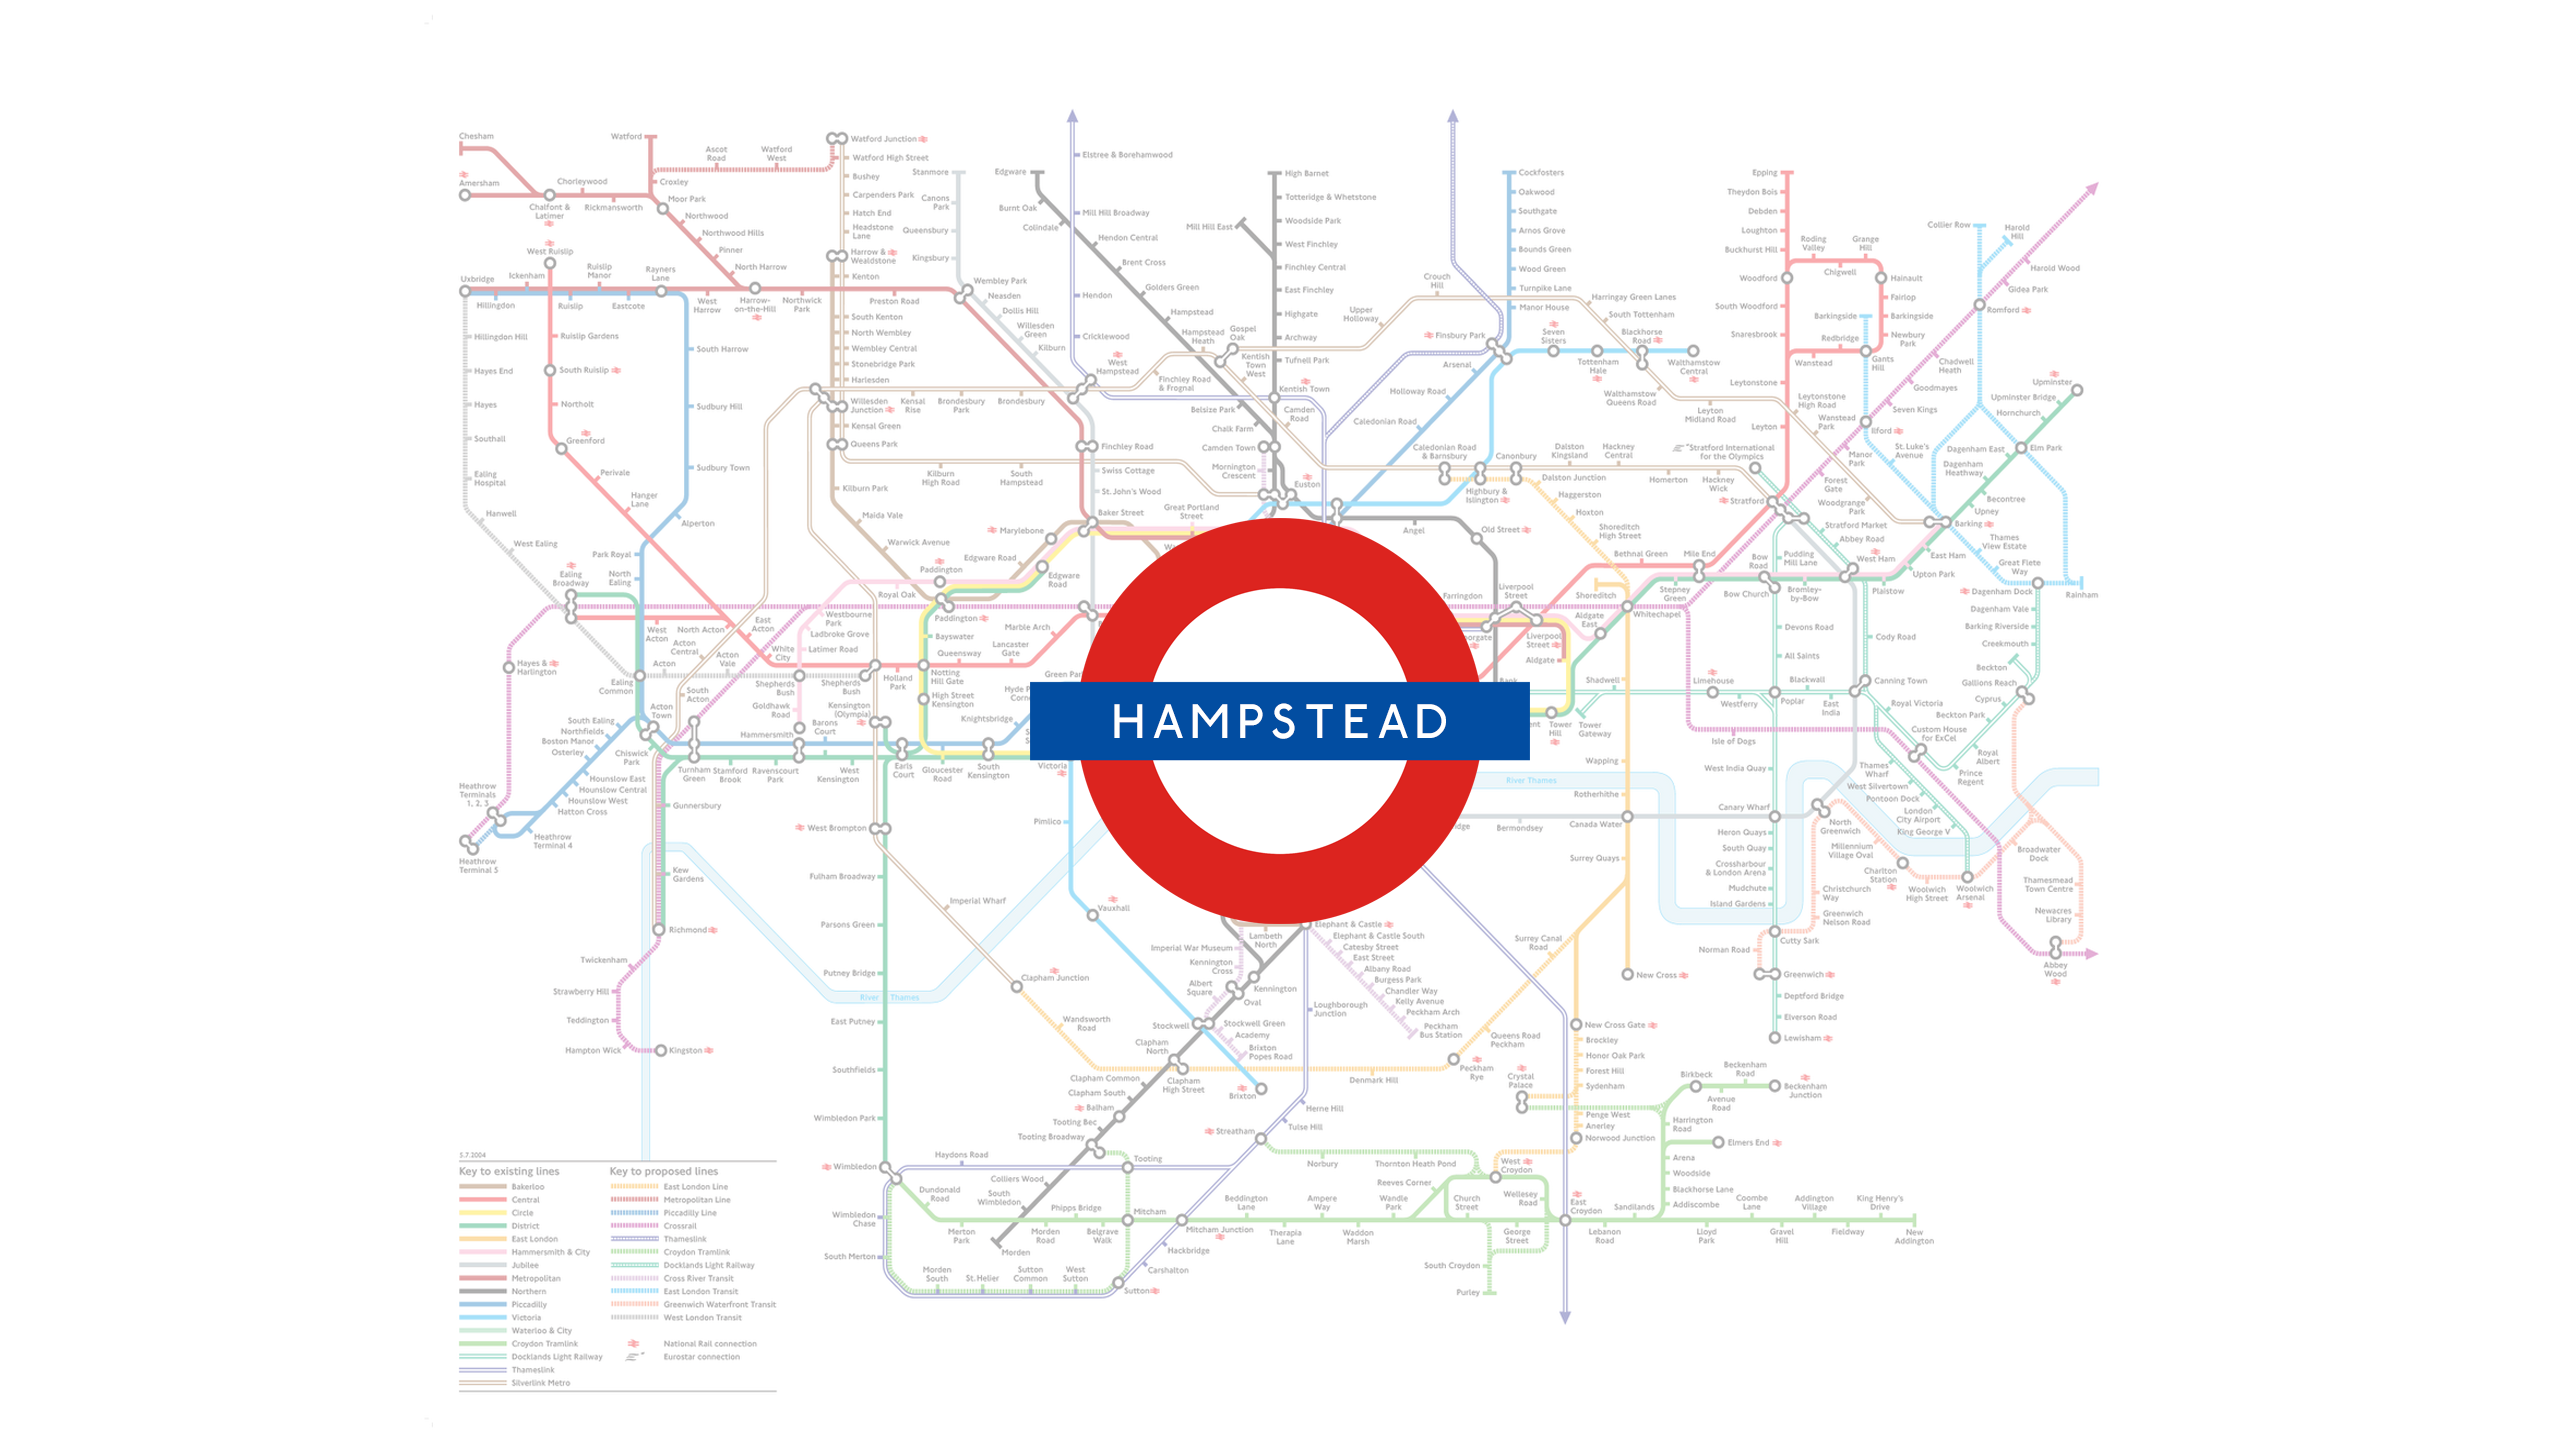 Hampstead (Map)